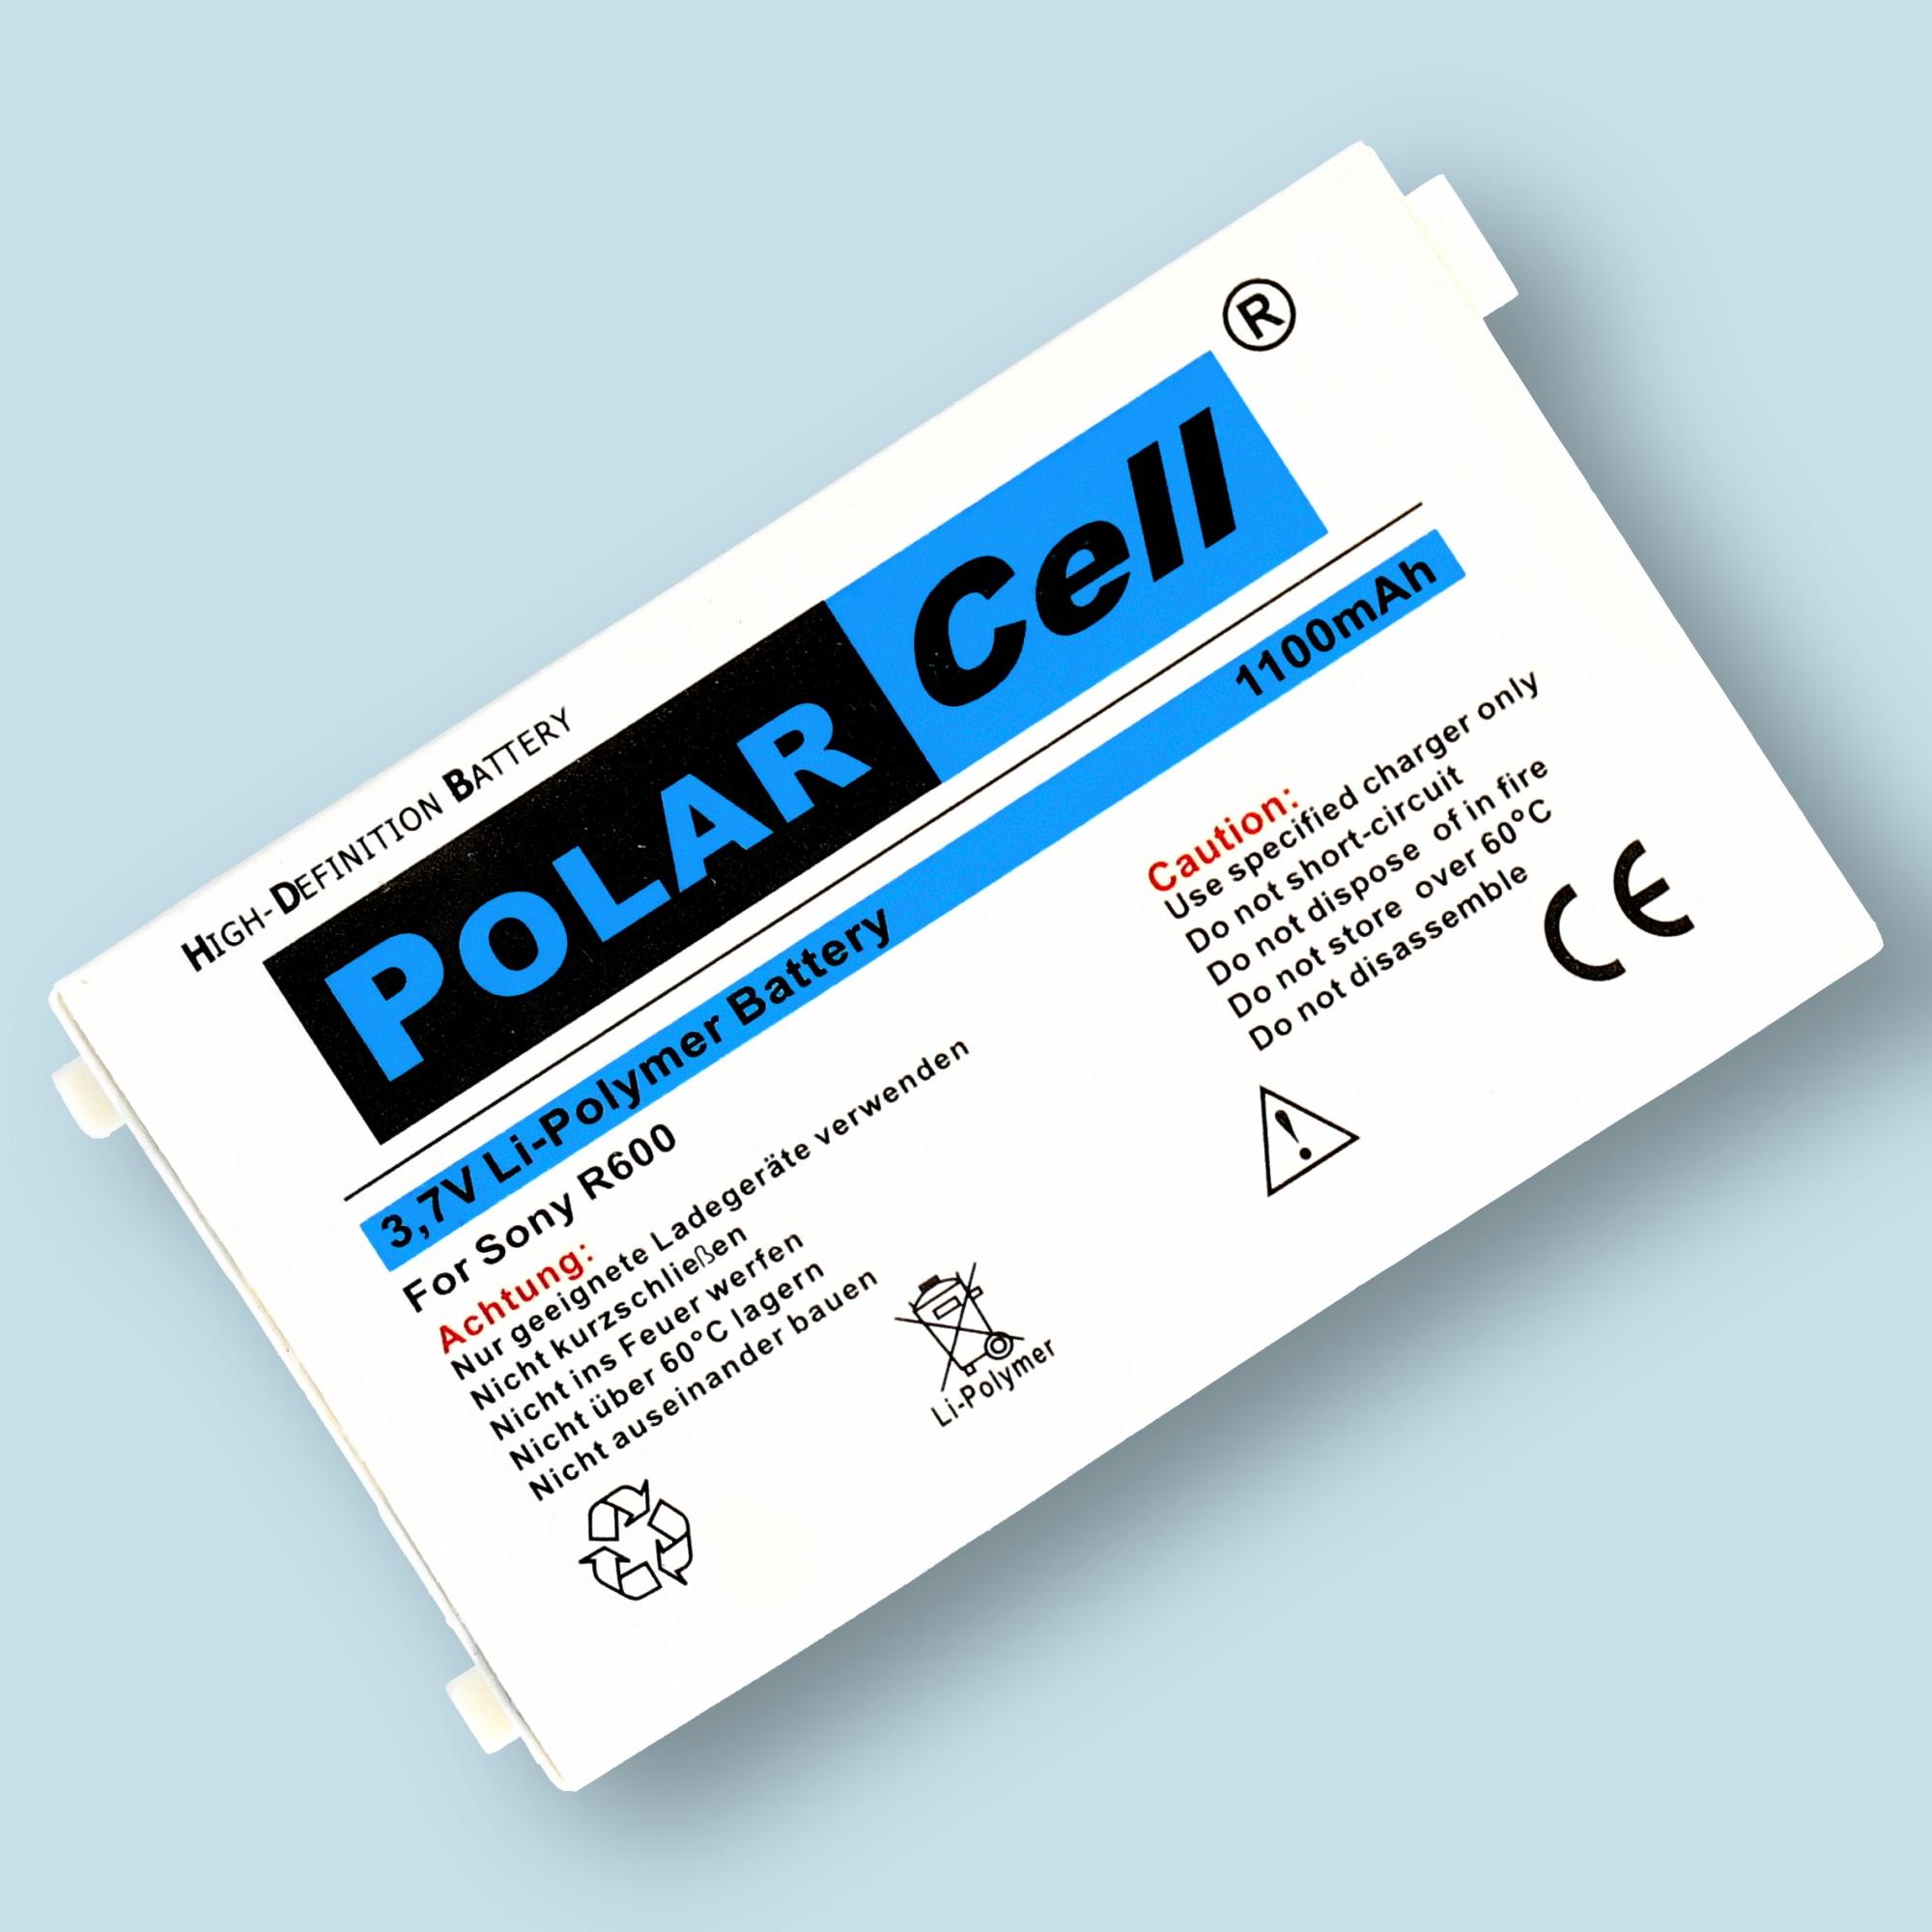 PolarCell-Batterie-pour-Sony-Ericsson-R600-BST-20-1100mAh-Li-Polymer